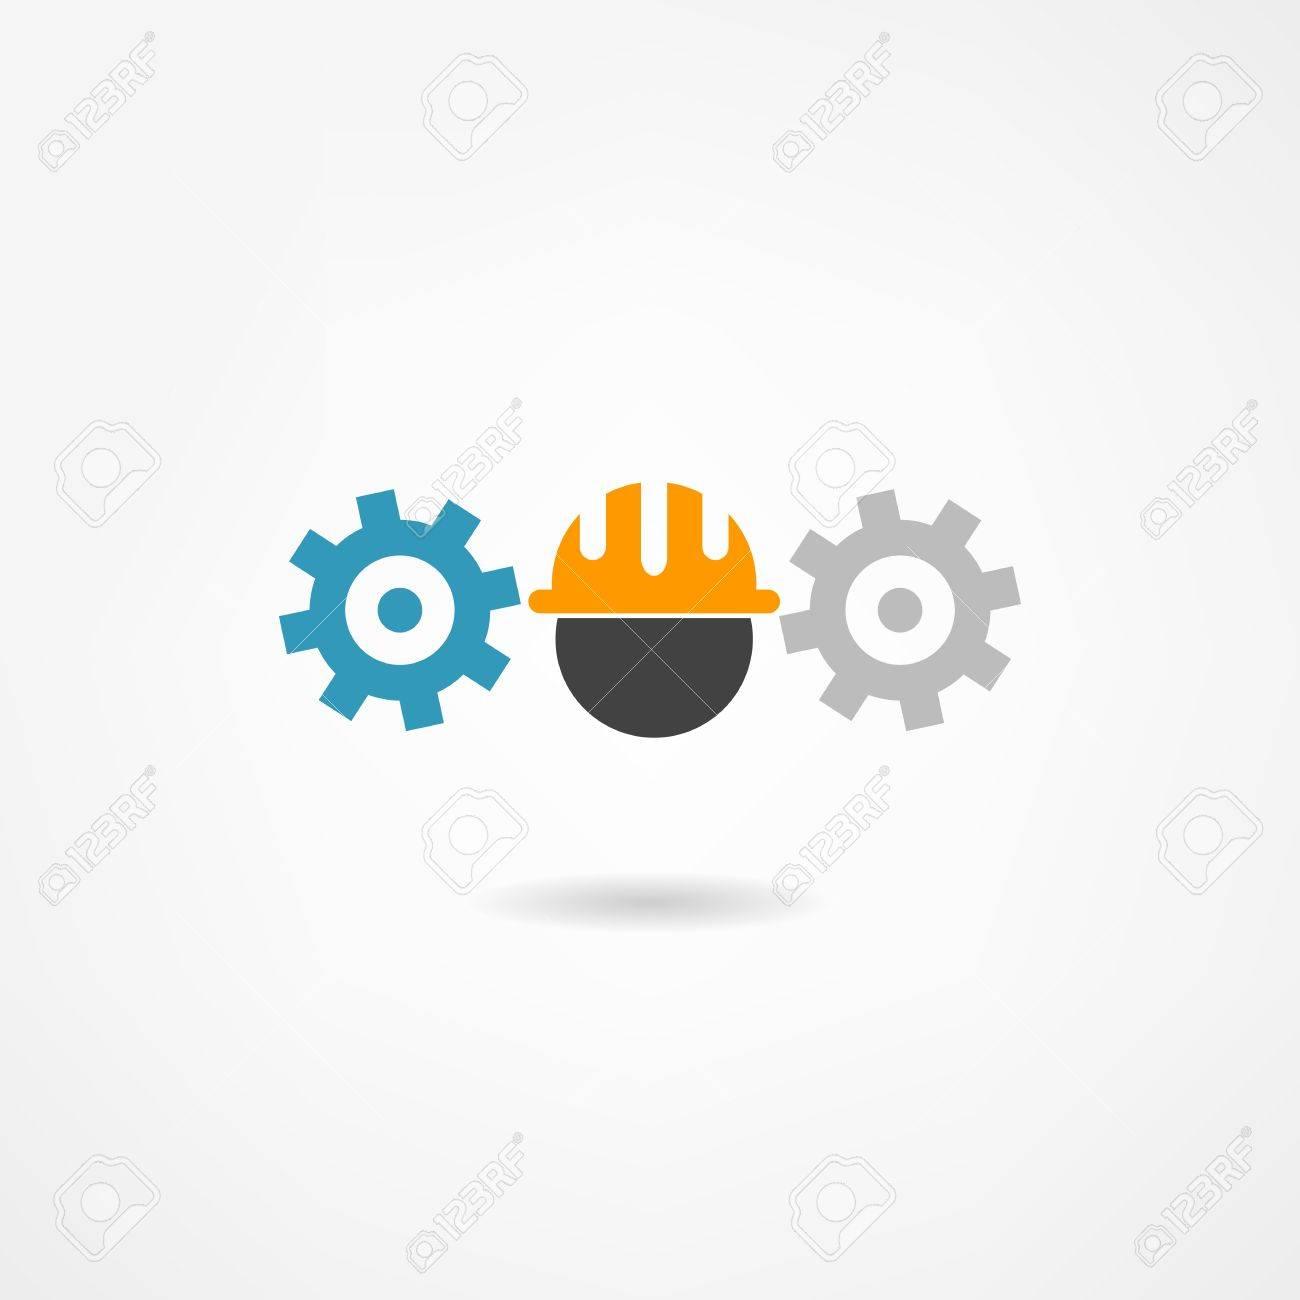 engineer icon Stock Vector - 21450630